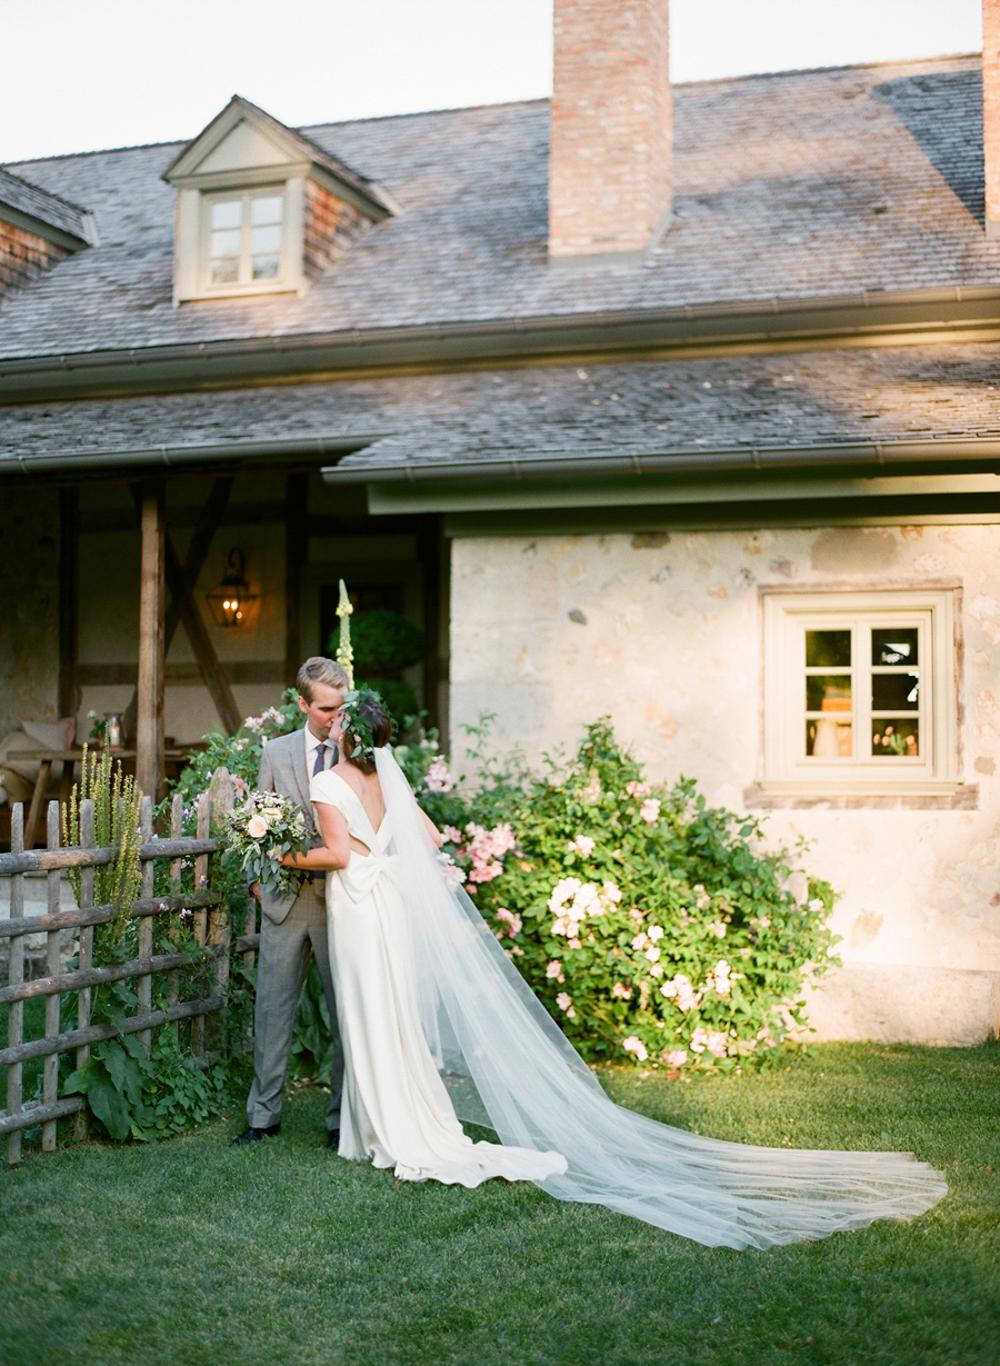 Ramhorn_Farm_Wedding_Photos_022.jpg